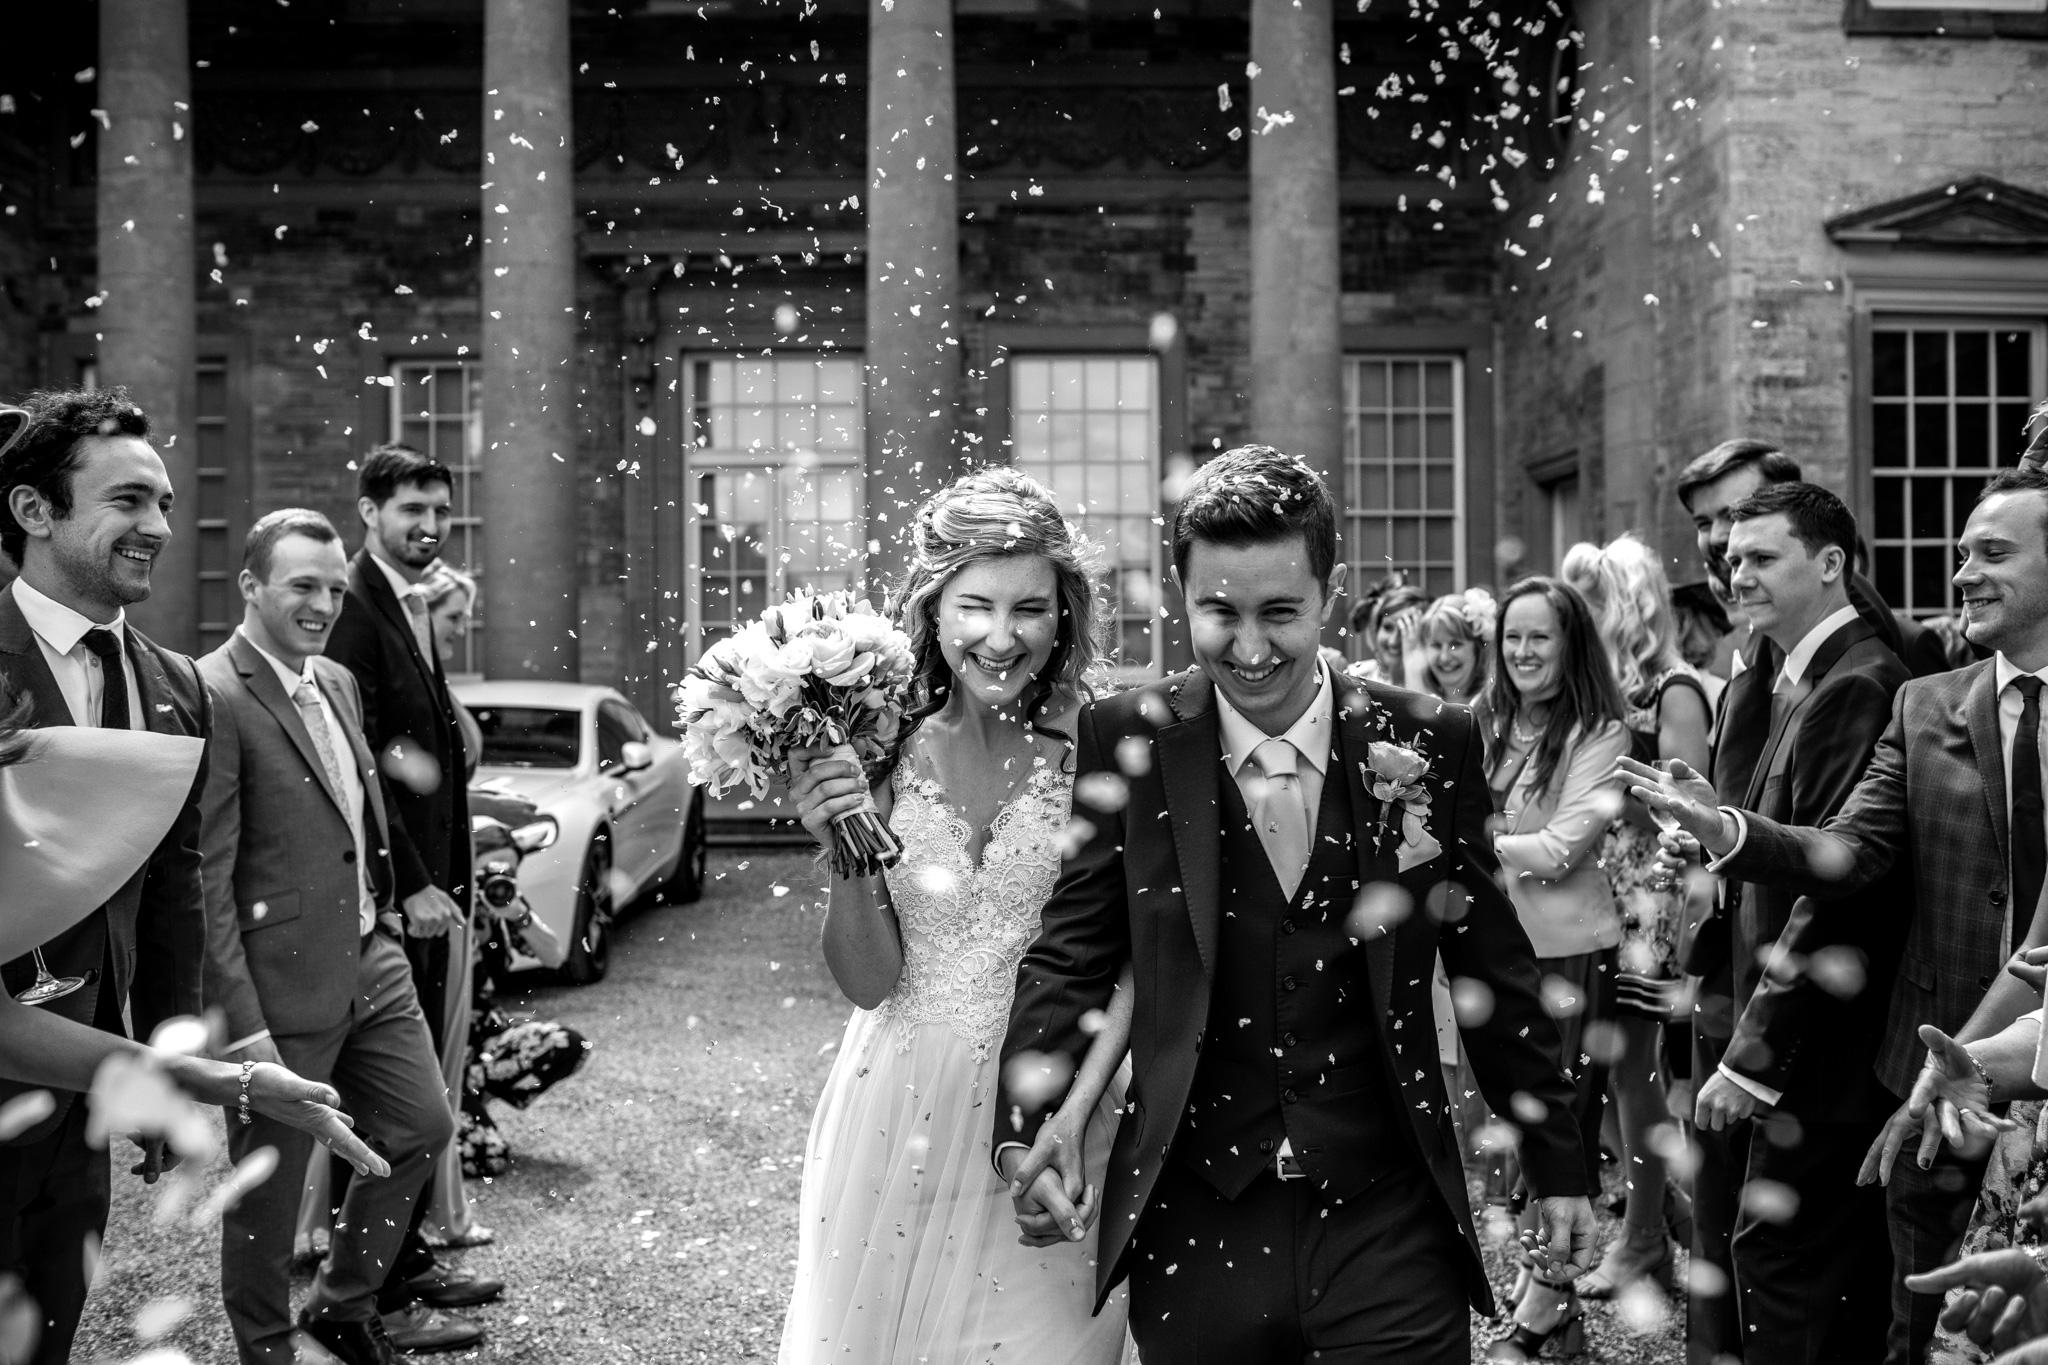 Compton Verney wedding couple walking through confetti